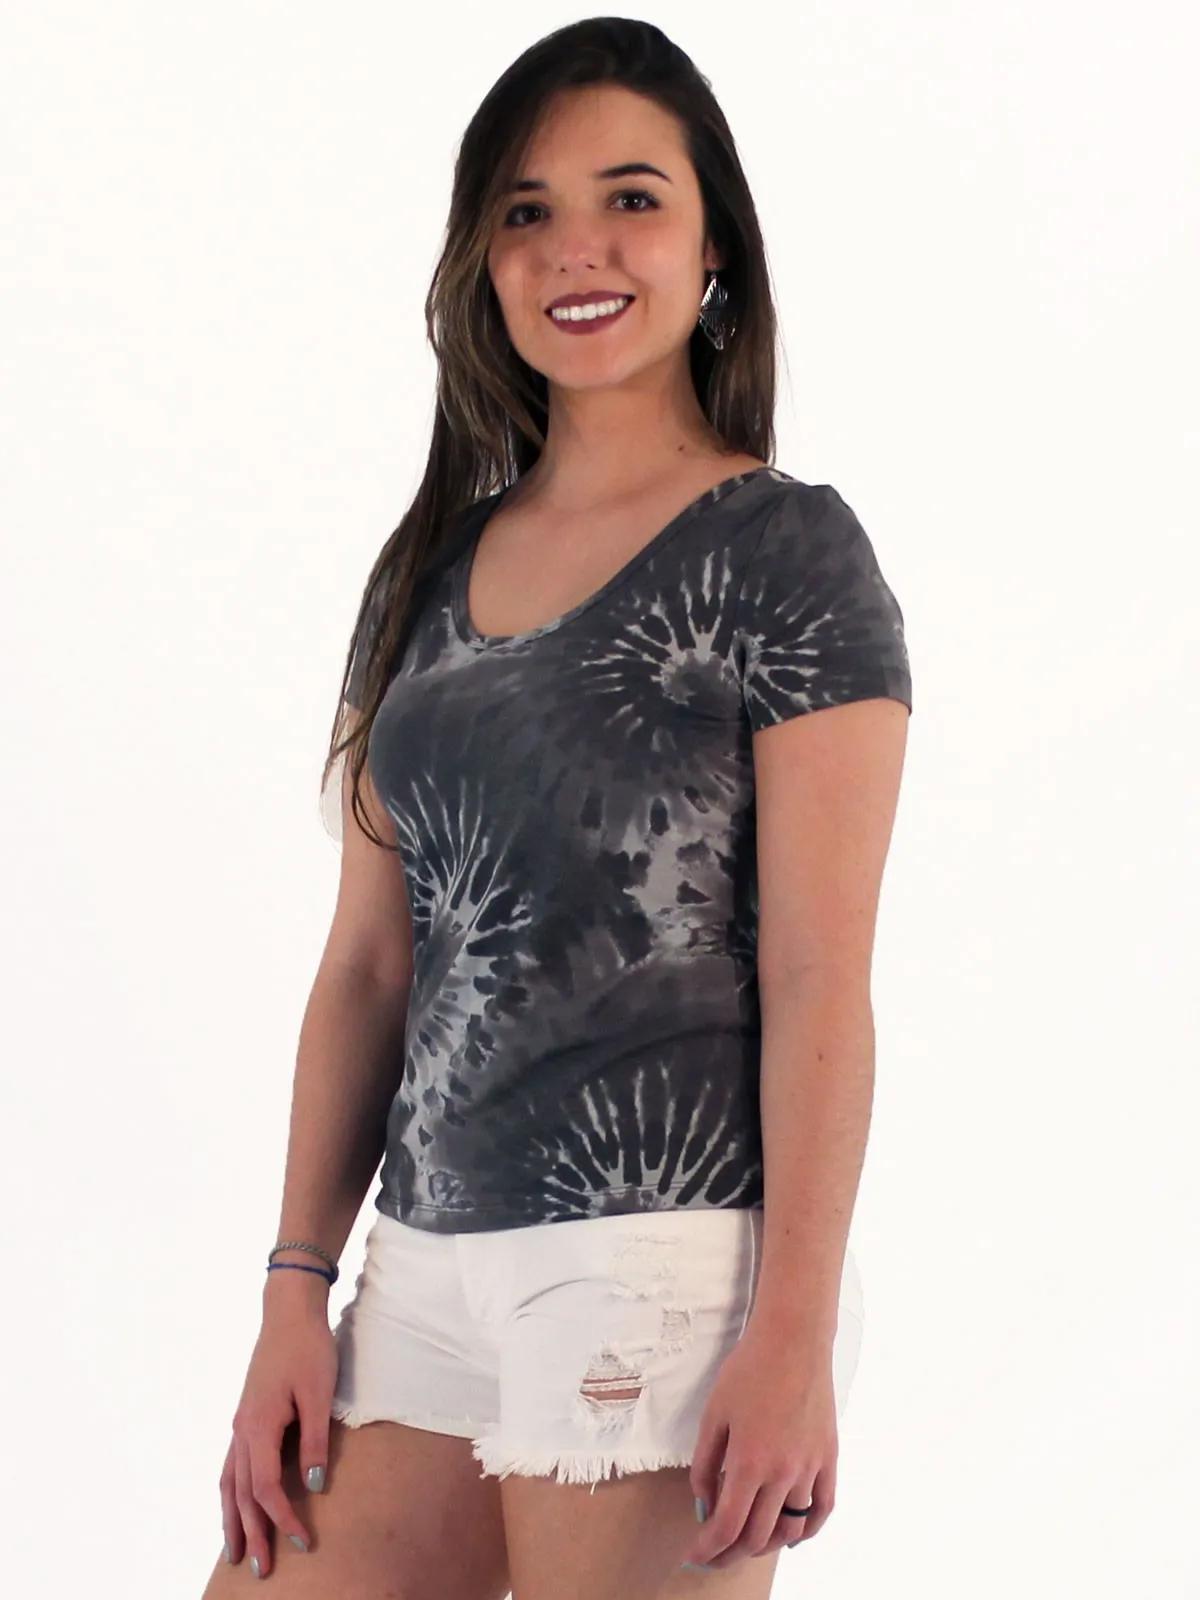 Blusa Camiseta Feminina Tie Dye Macia Manga Curta Preto